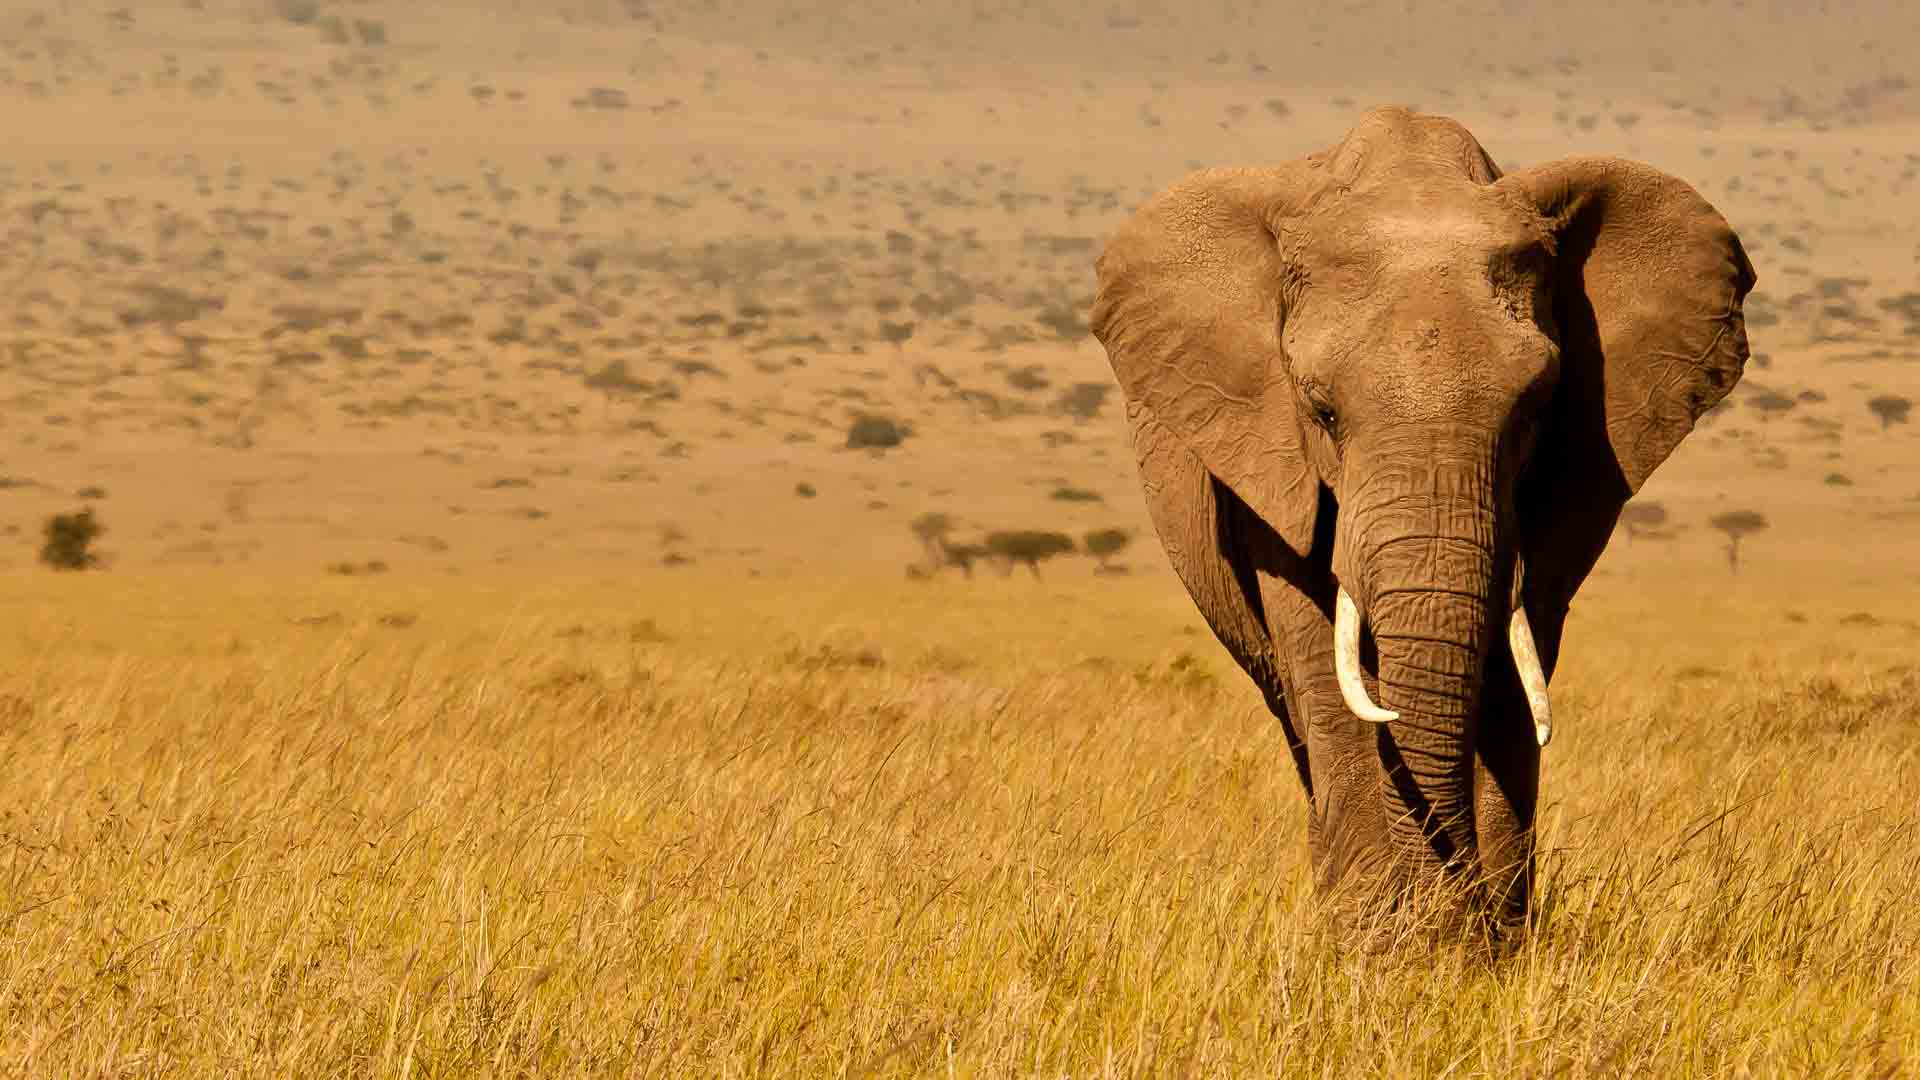 kenya-wildlife-elephant-copyright-will-bolsover